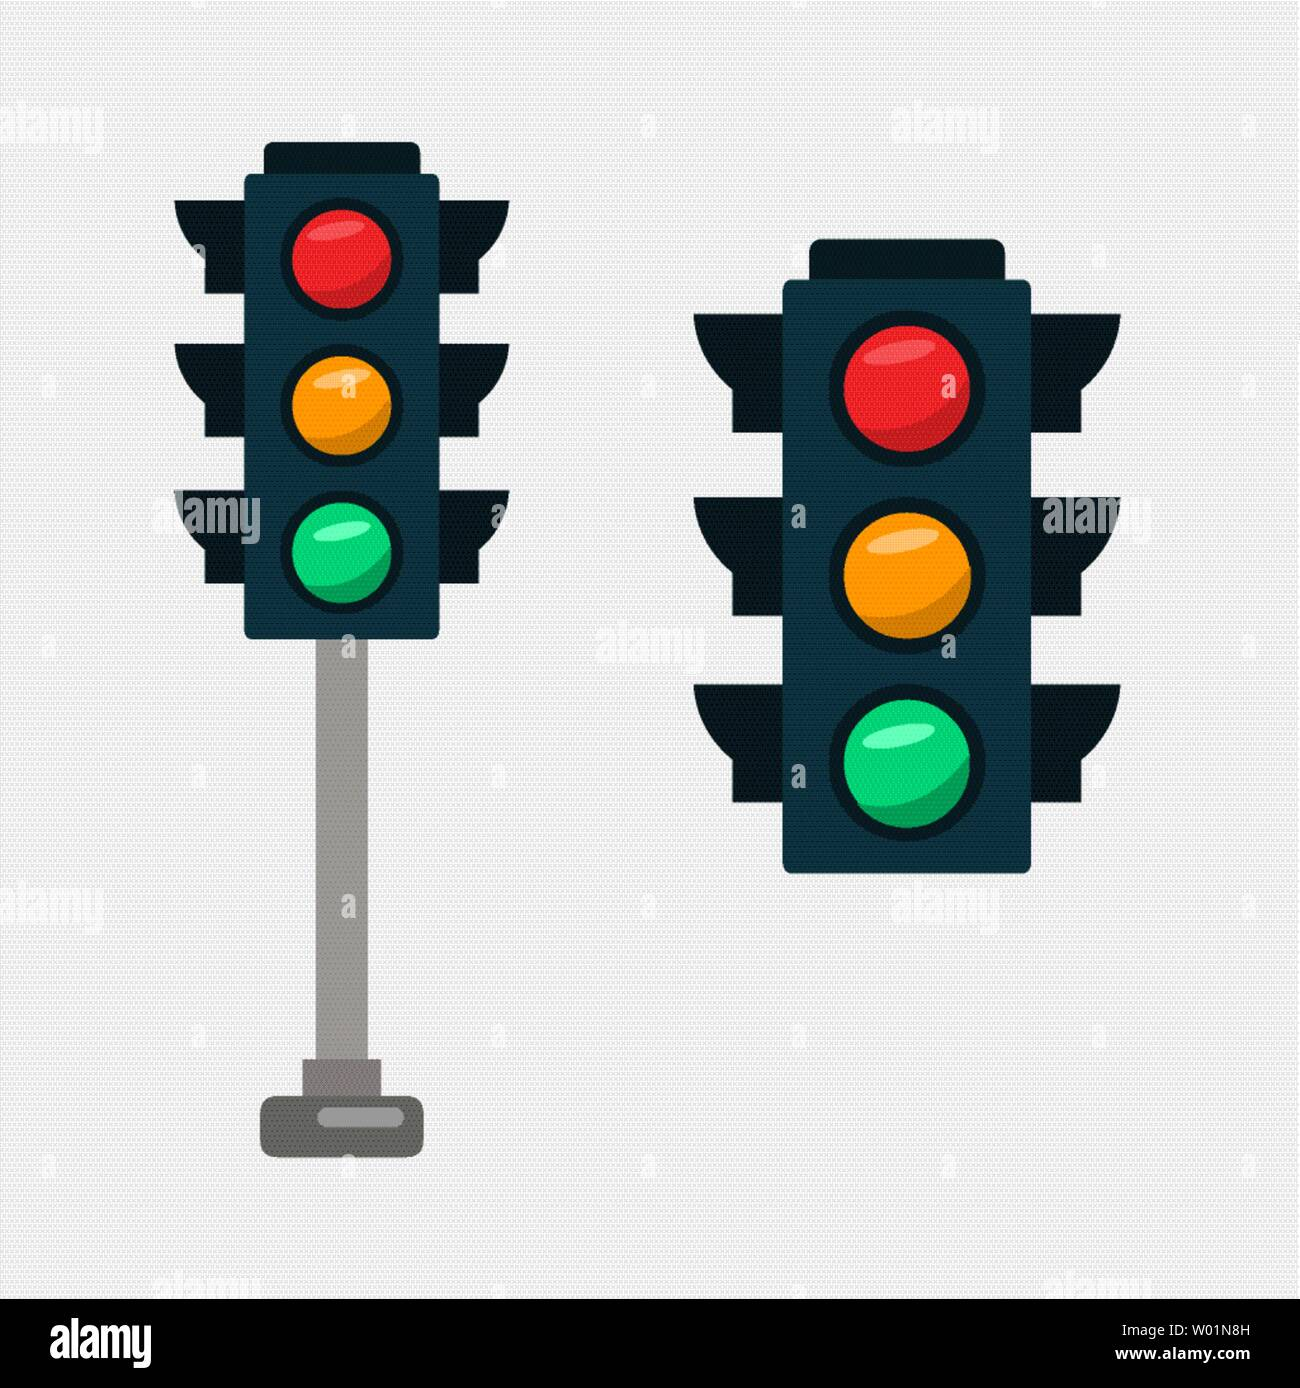 traffic light vector illustration stock vector image art alamy https www alamy com traffic light vector illustration image258194177 html